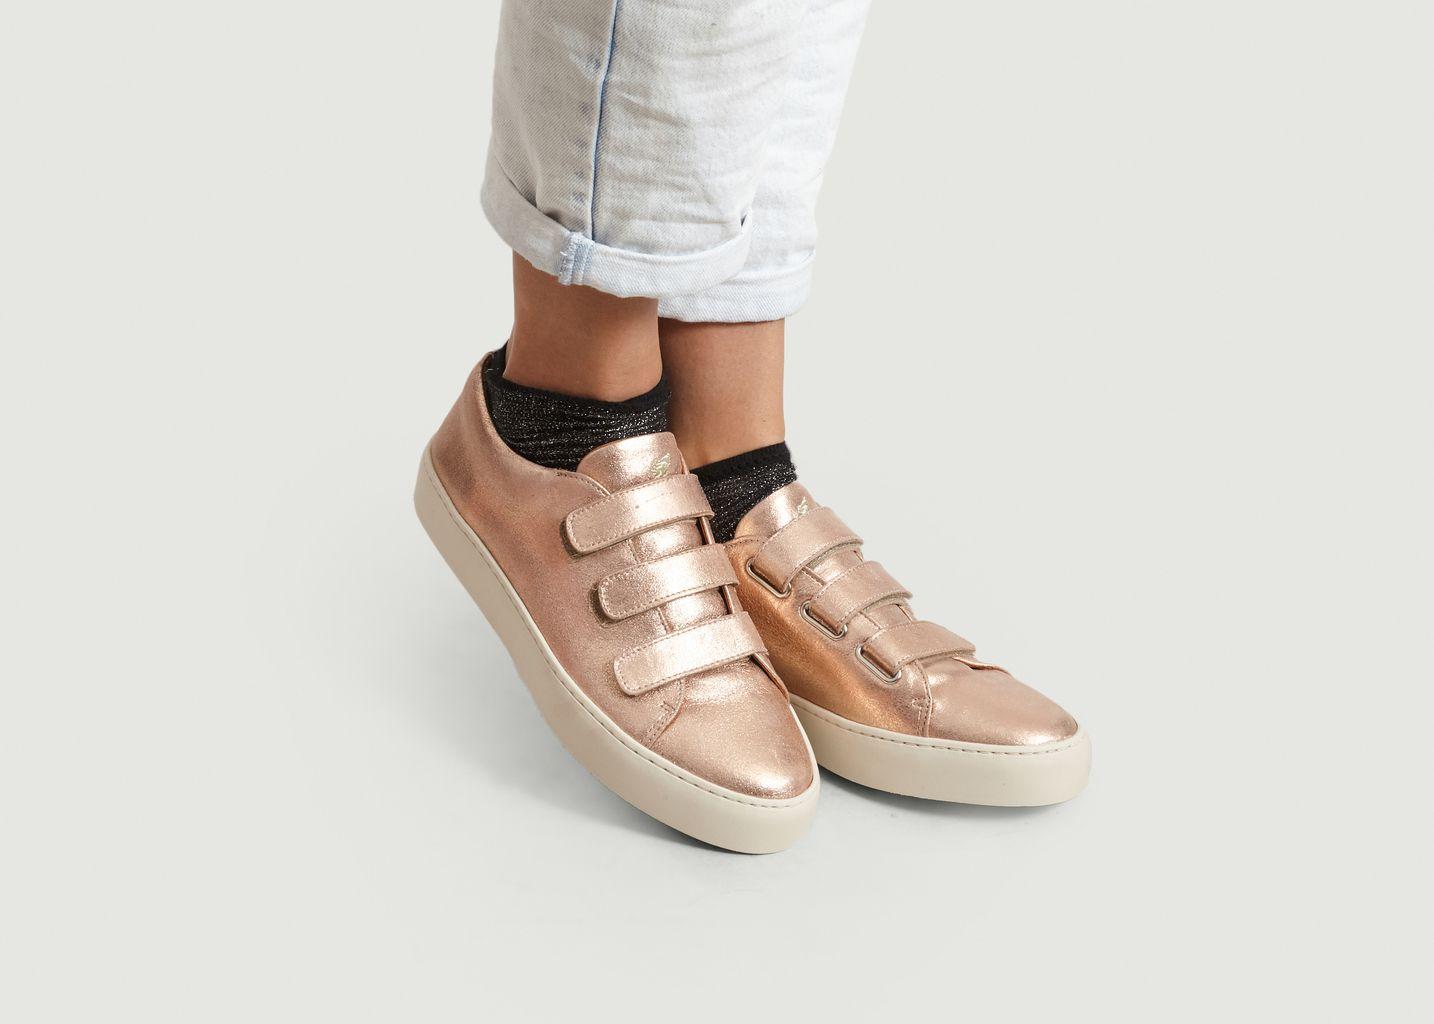 Sneakers Lamées La Turbulente - Bobbies